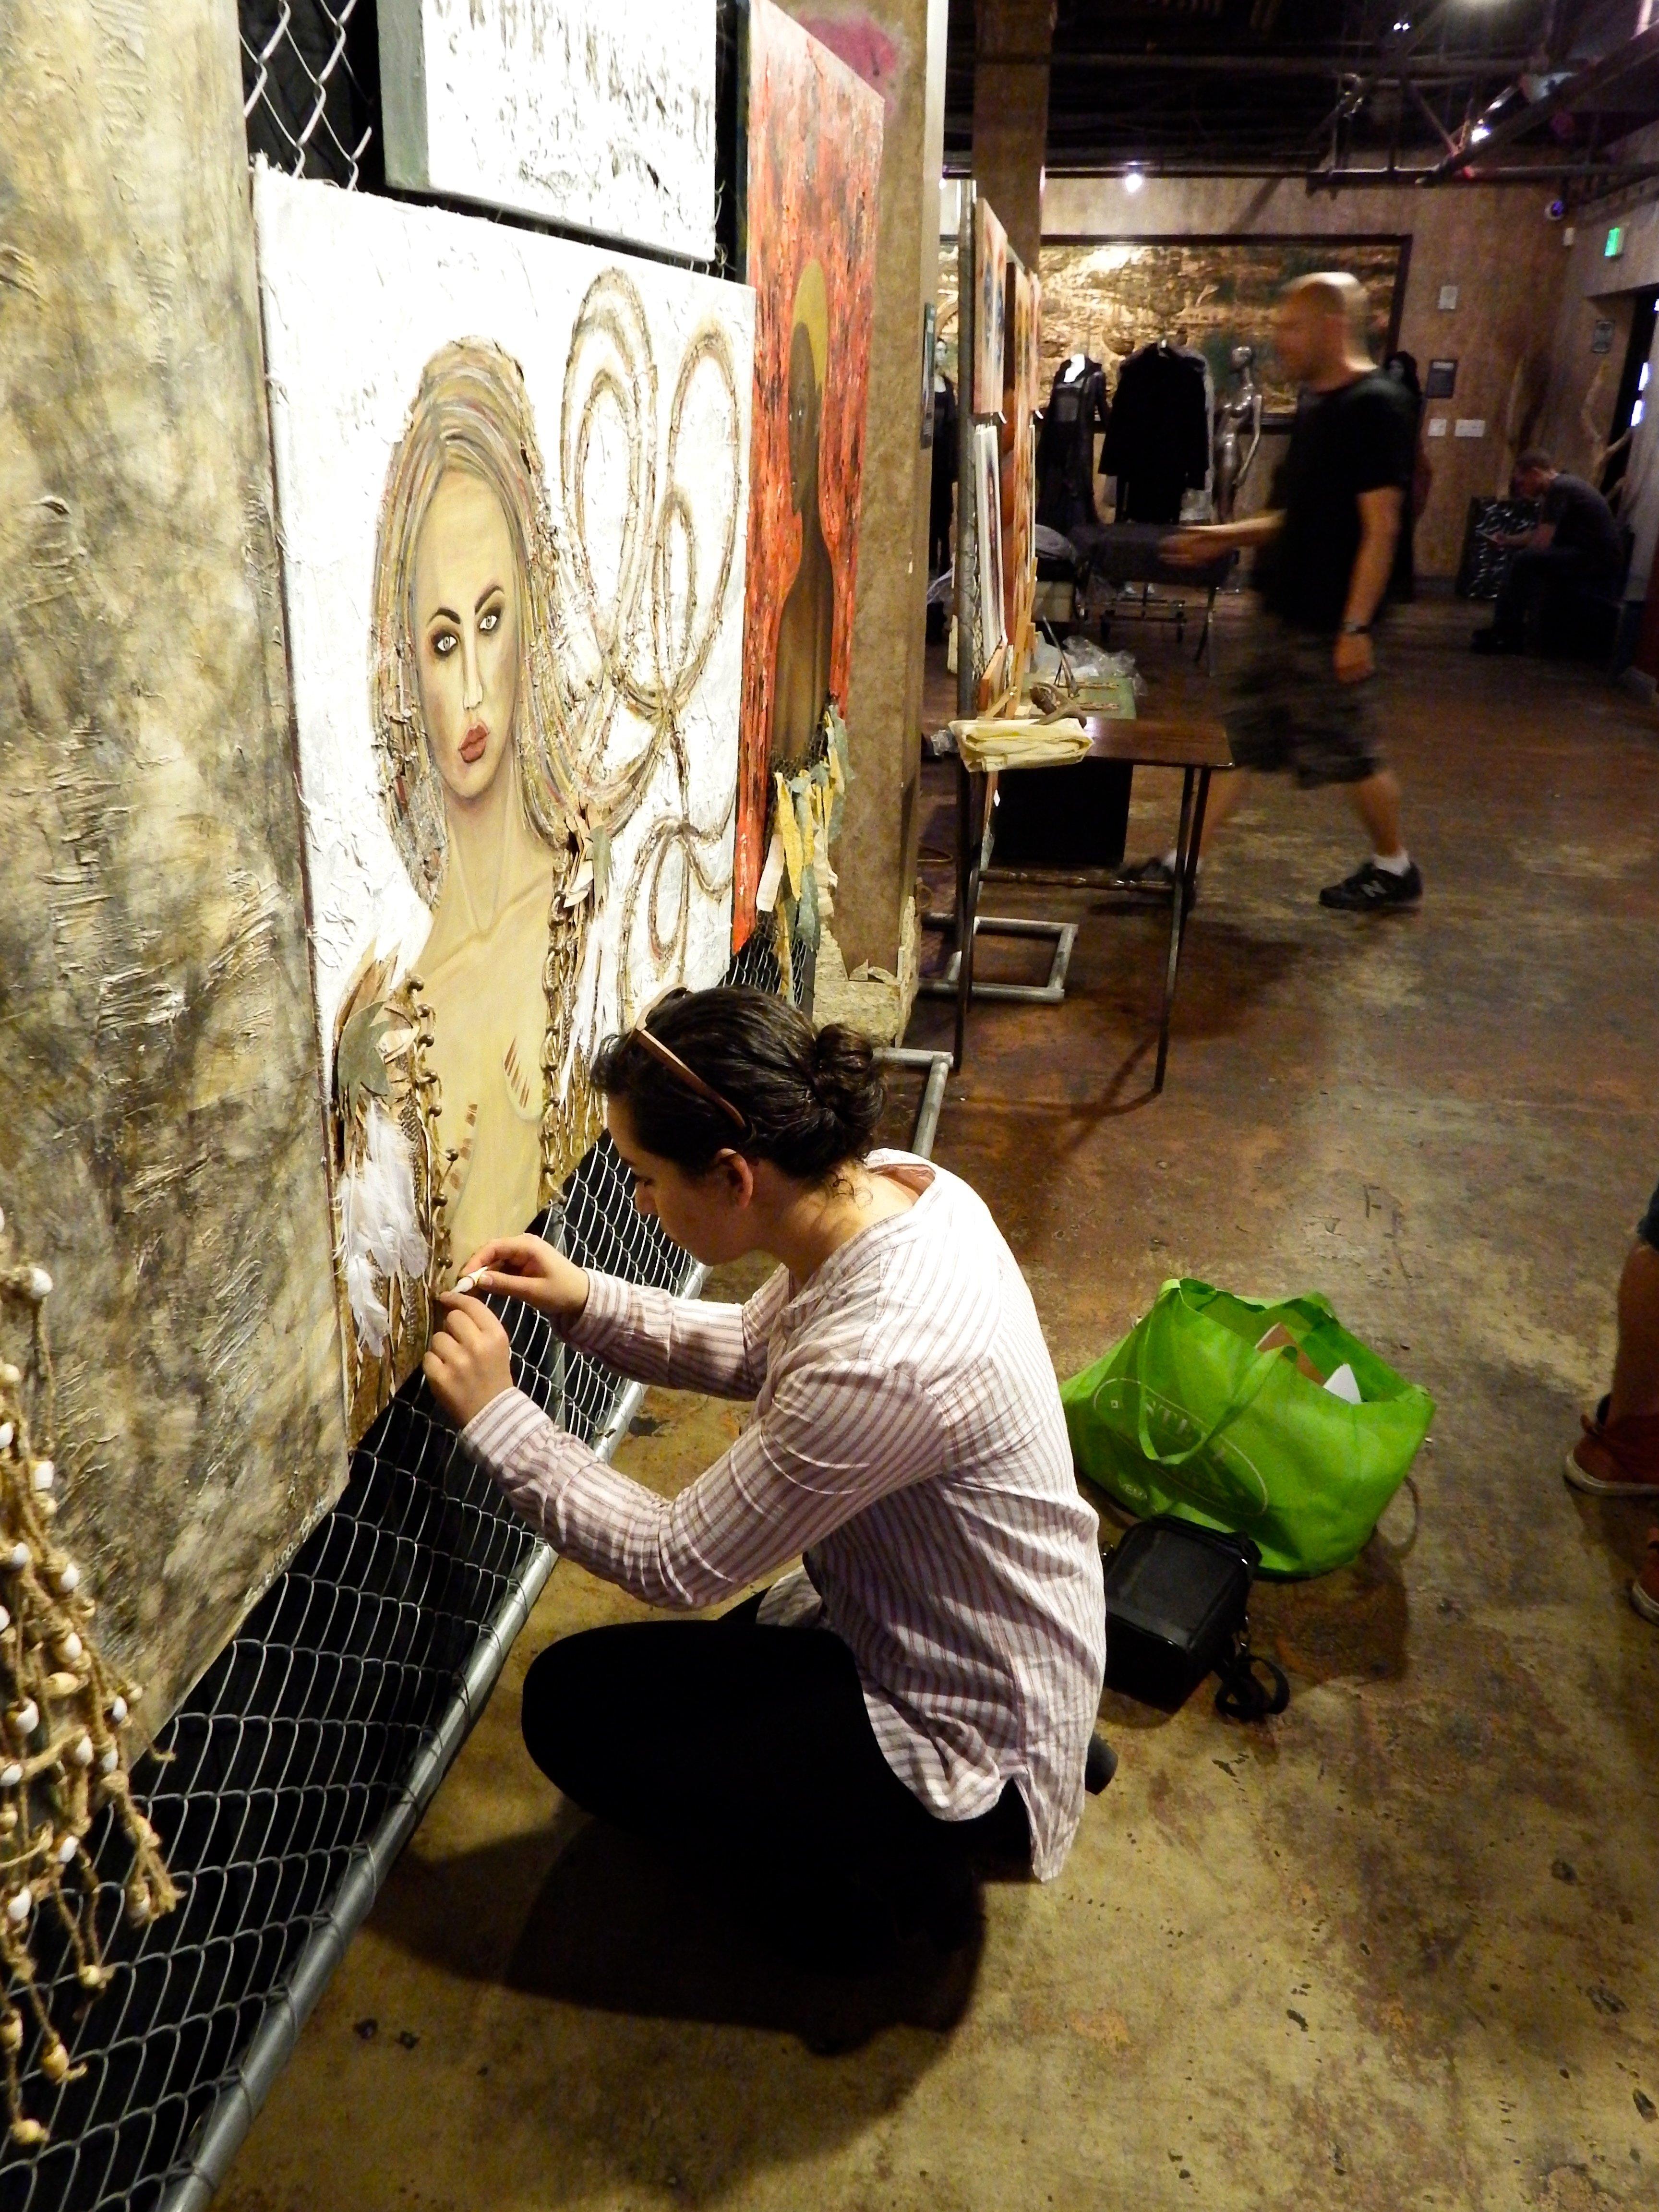 5th Annual RAWards Indie Art Show: Founder's Favorite Artist Sabrina Brett 2